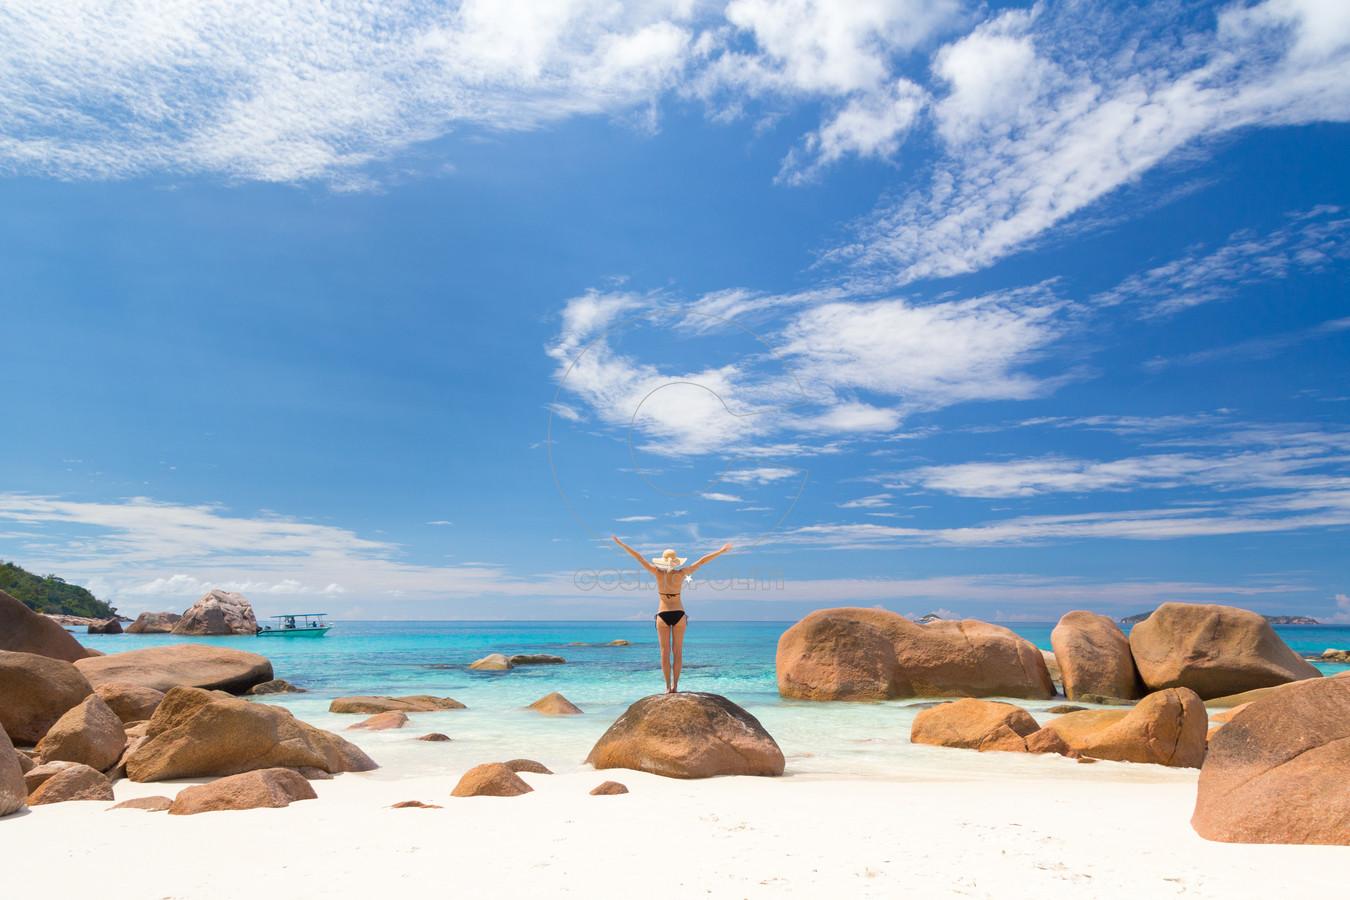 Seychelles lifestyle at Anse Lazio Praslin